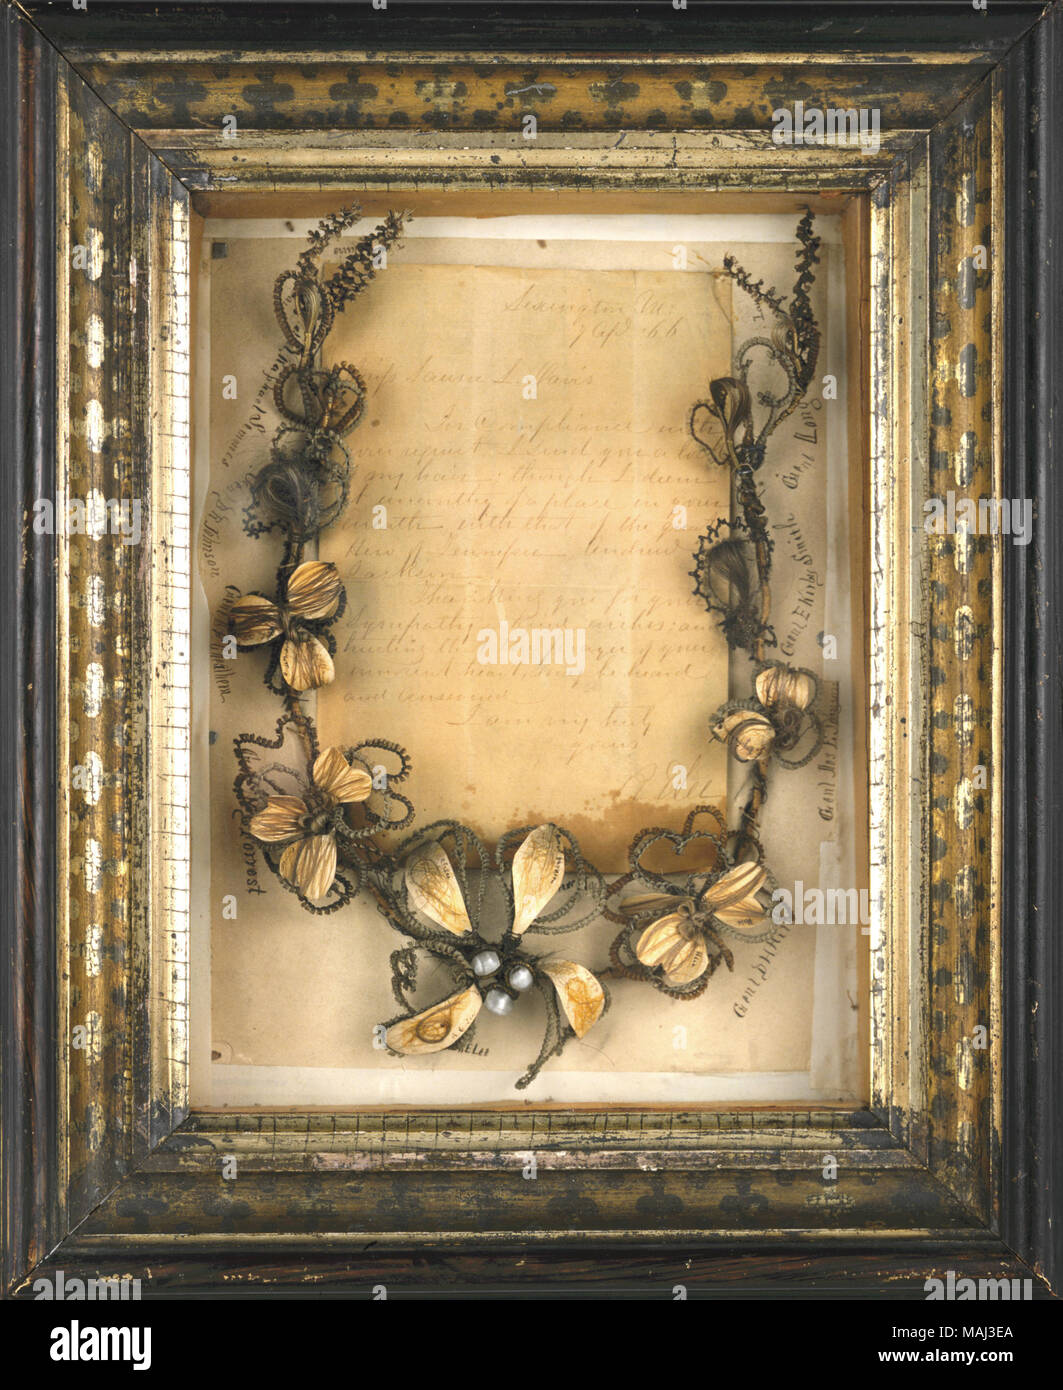 Shadow box framed hair wreath incorporating locks of hair of several ...